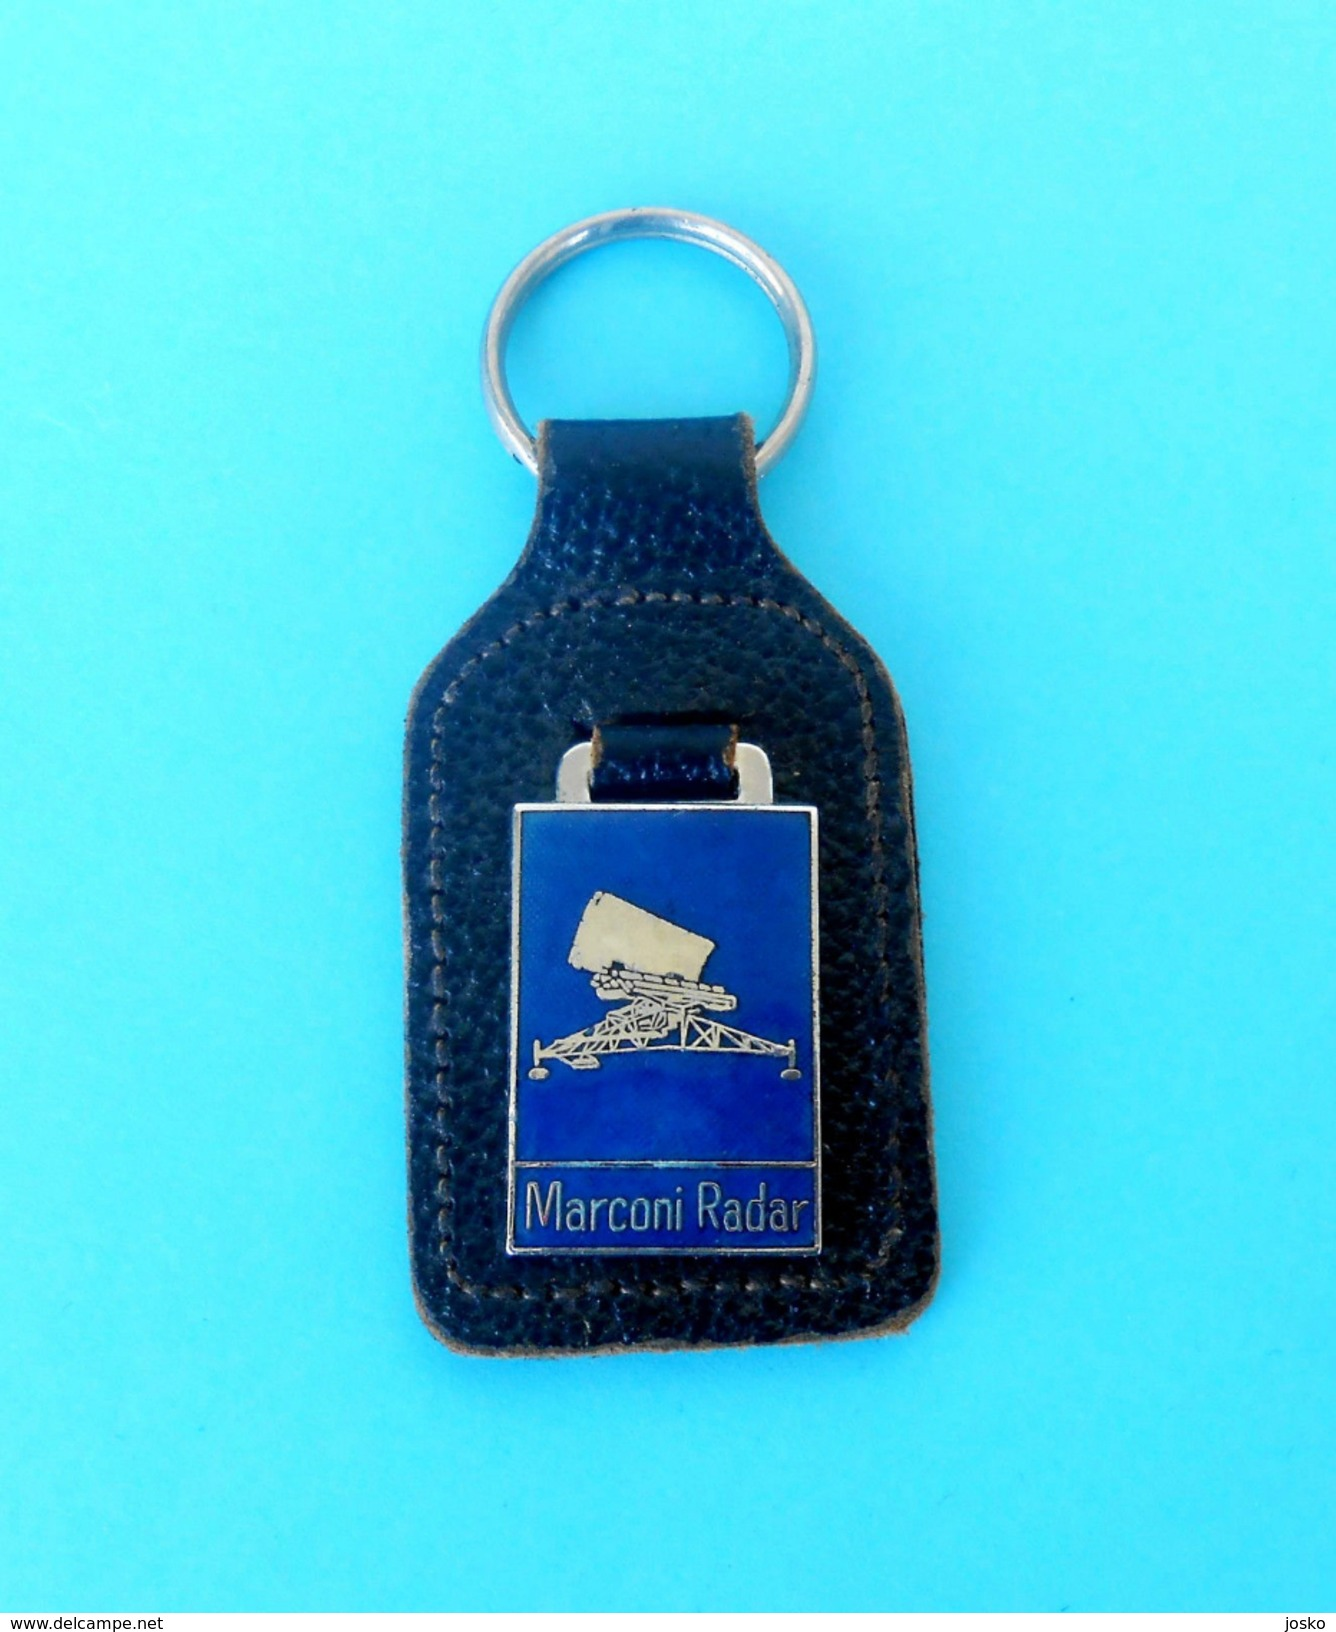 MARCONI RADAR ( Radio Detection And Ranging ) - Vintage Enamel Keychain *  Key-ring Porte-clés Schlüsselring Key-chain - Radio & TSF